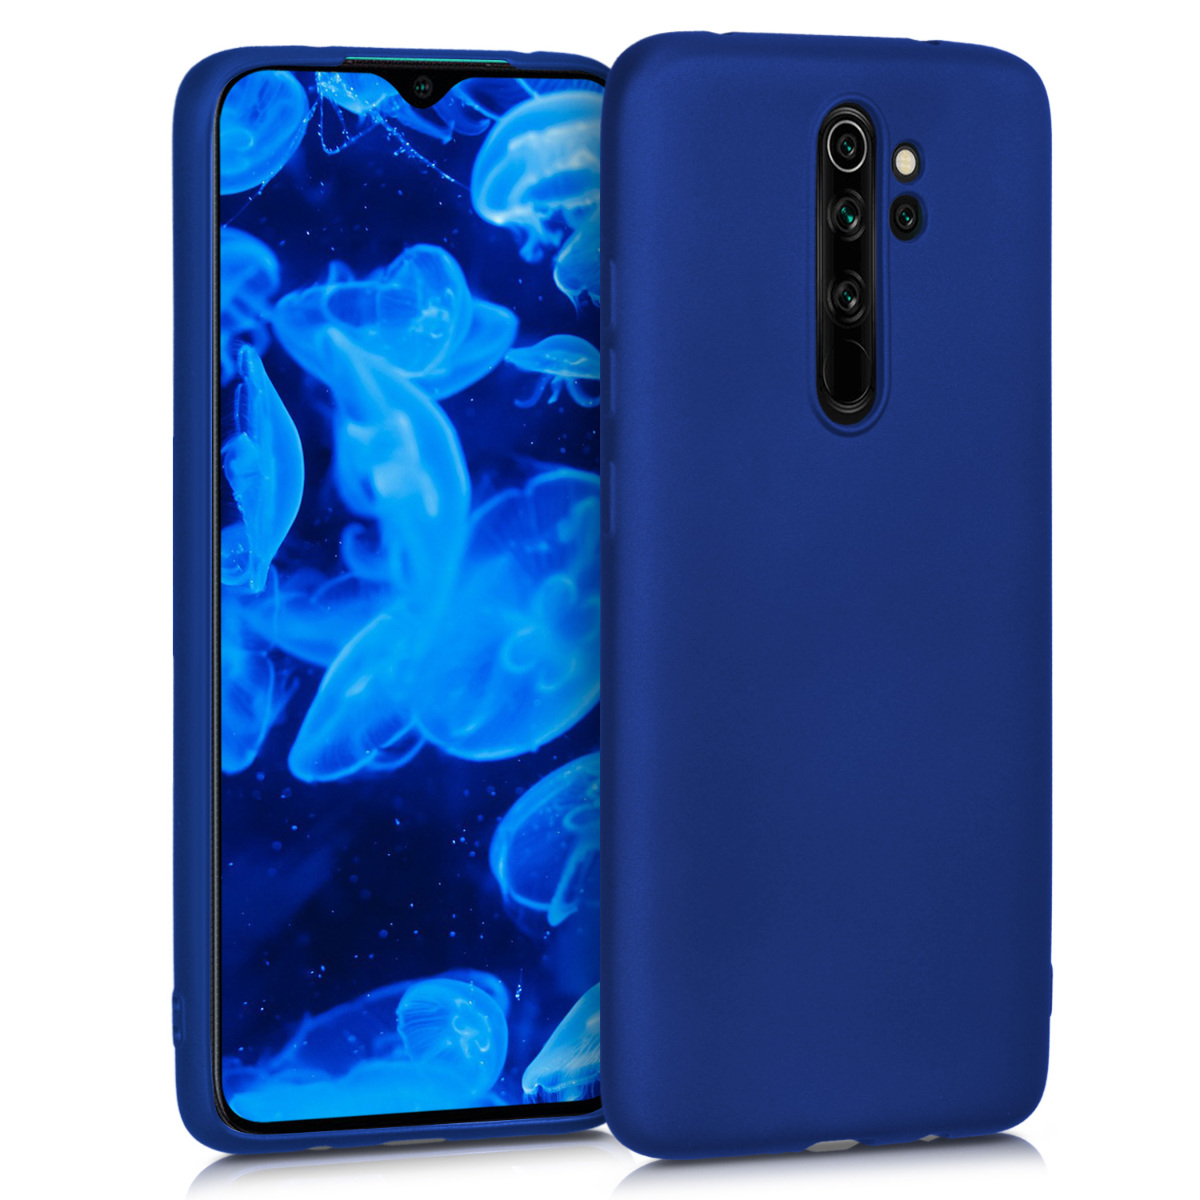 KW Θήκη Σιλικόνης Xiaomi Redmi Note 8 Pro - Metallic Blue (50243.64)